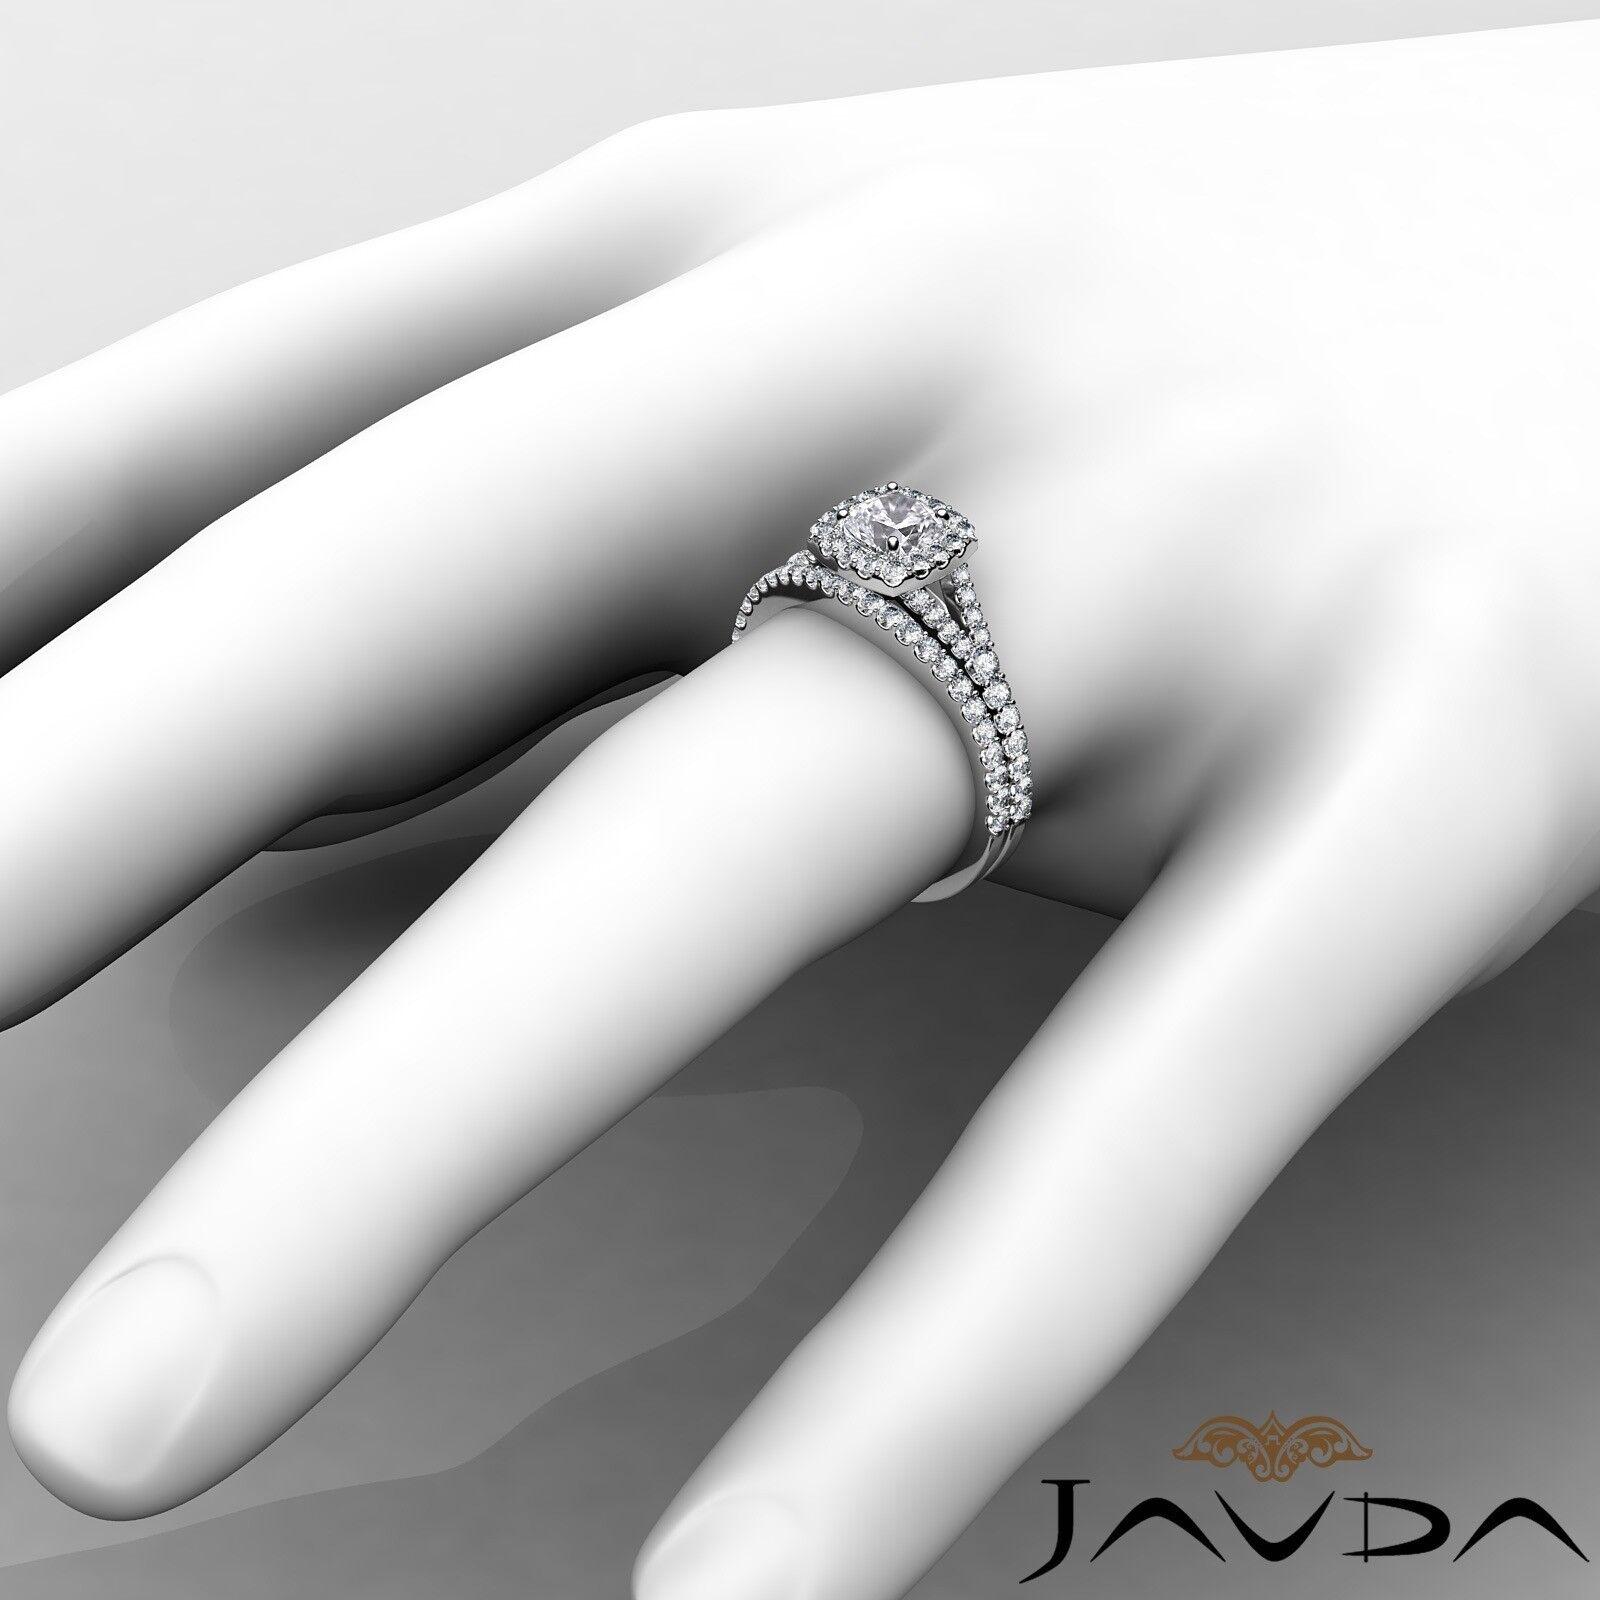 1.5ctw U Cut Pave Halo Bridal Cushion Diamond Engagement Ring GIA F-VS2 W Gold 4